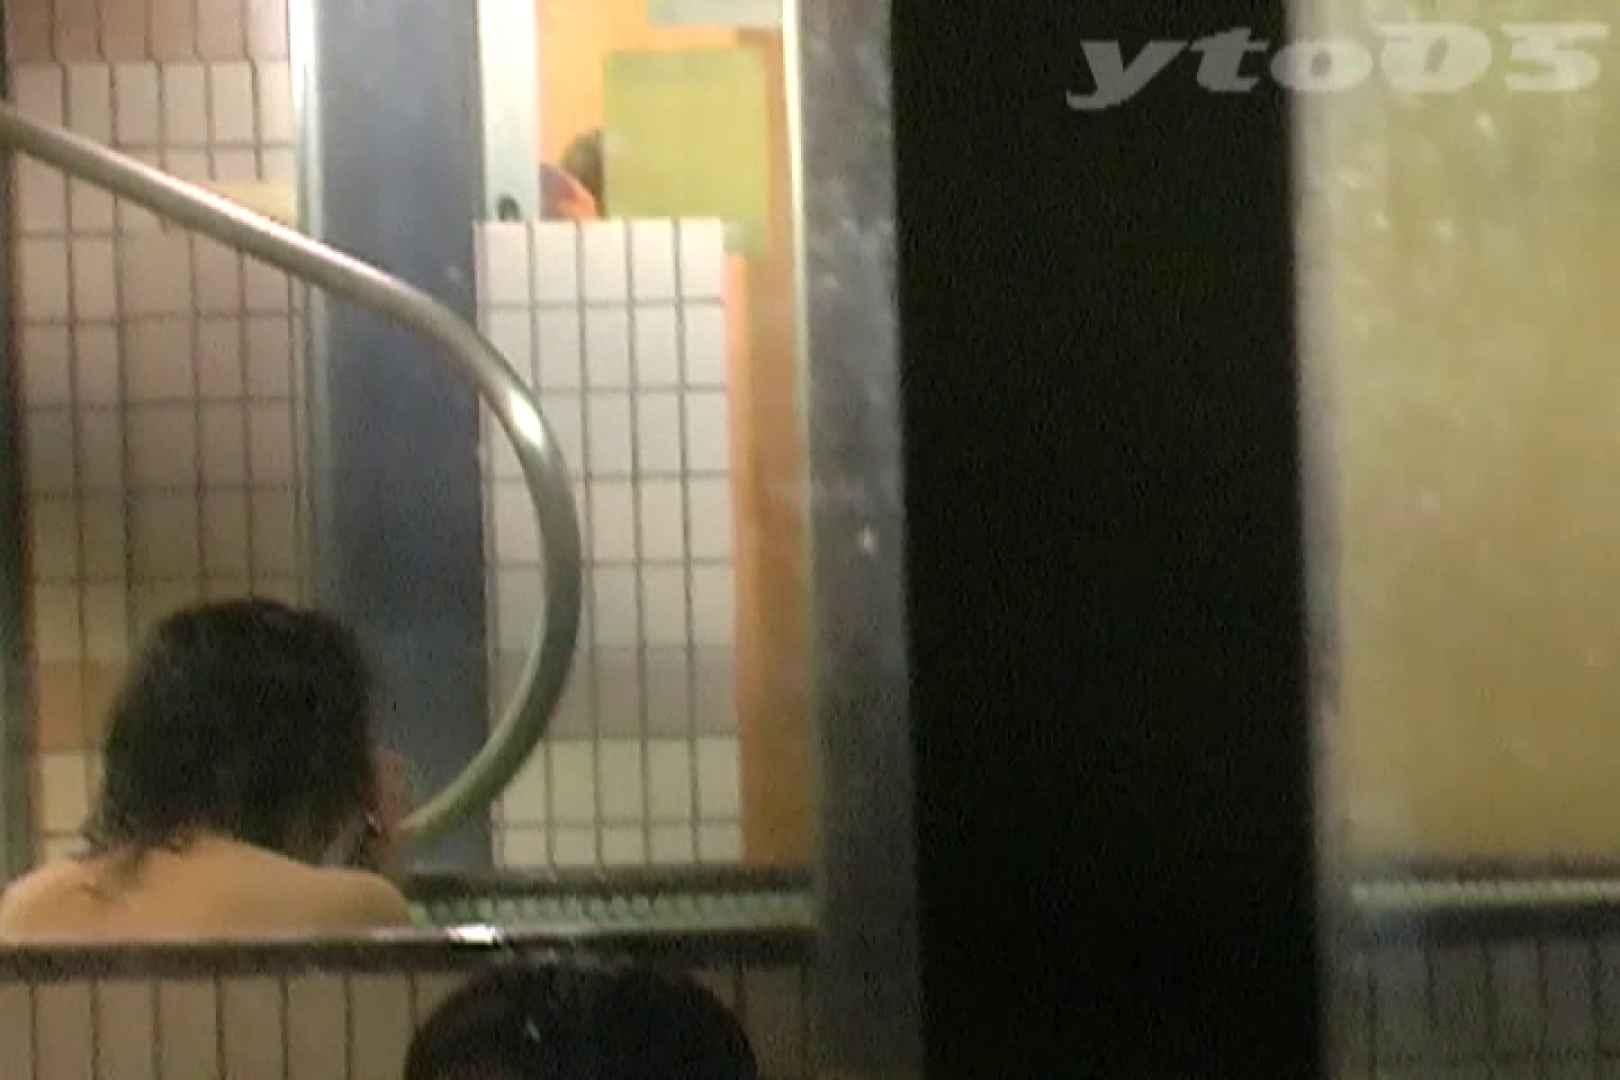 ▲復活限定▲合宿ホテル女風呂盗撮 Vol.28 OL | 合宿  38連発 3